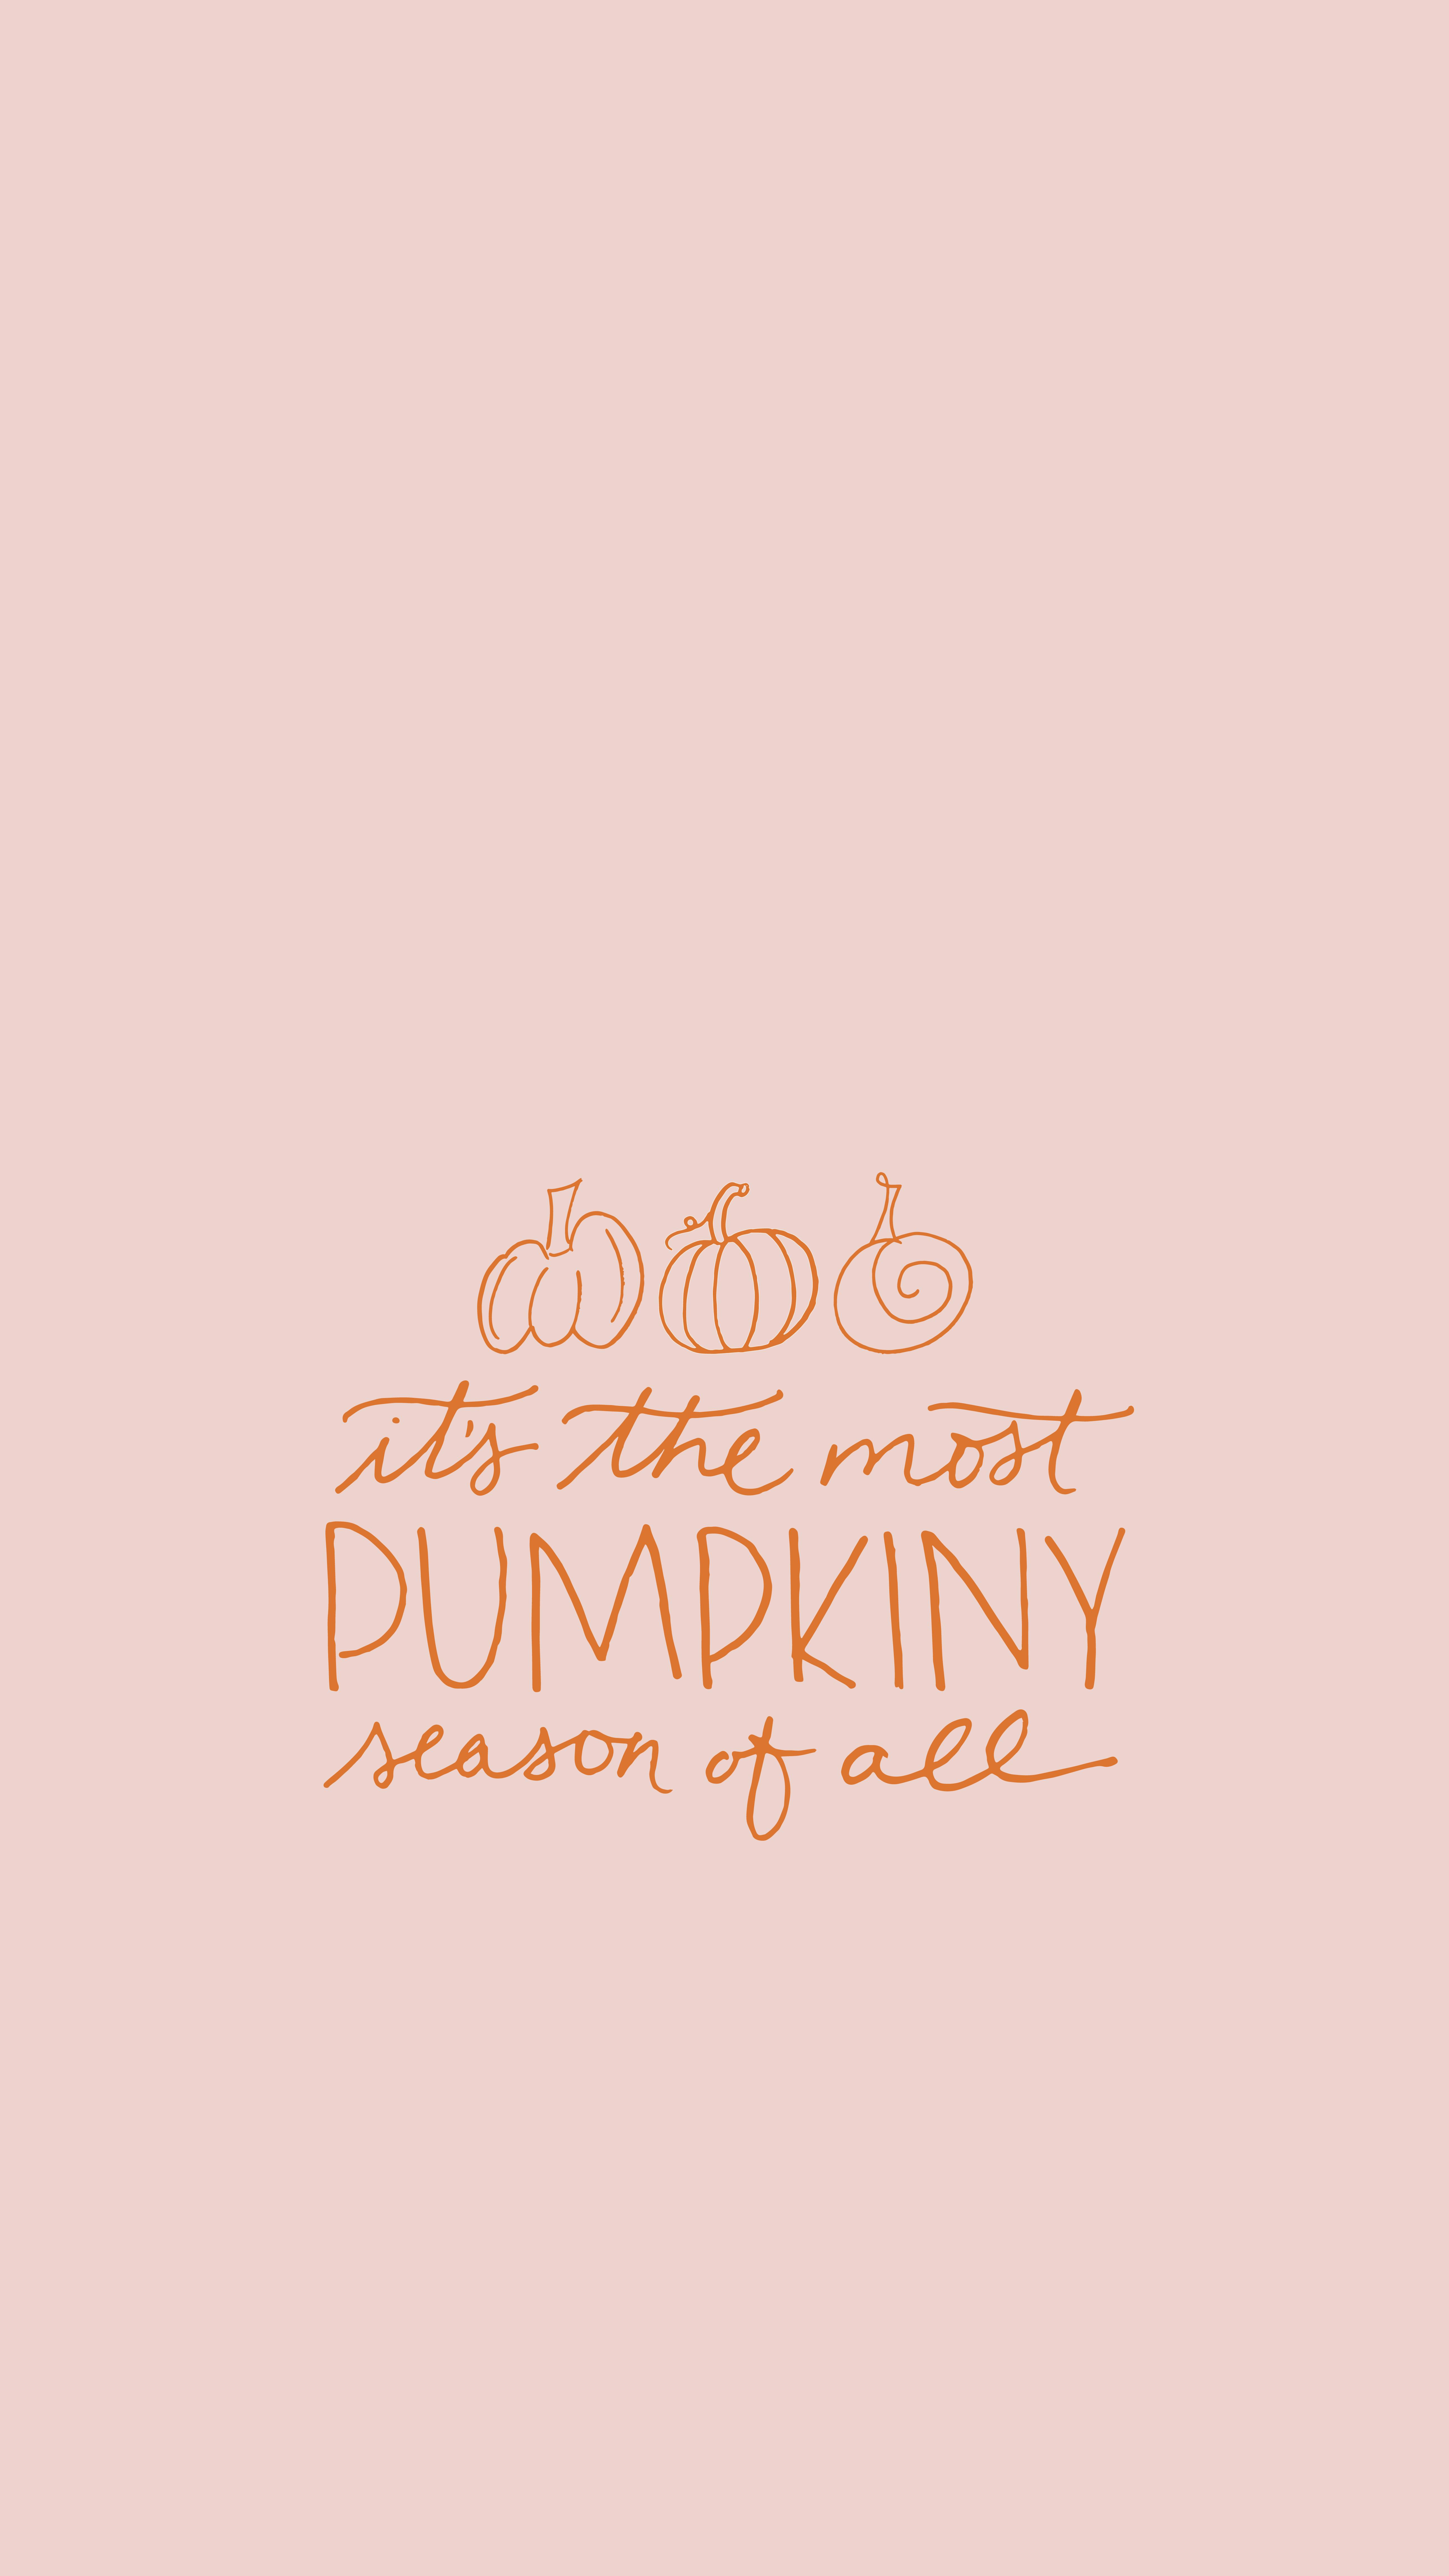 StyldbyGrace_October2018_Wallpapers_ItsTheMostPumpkinySeasonOfAll